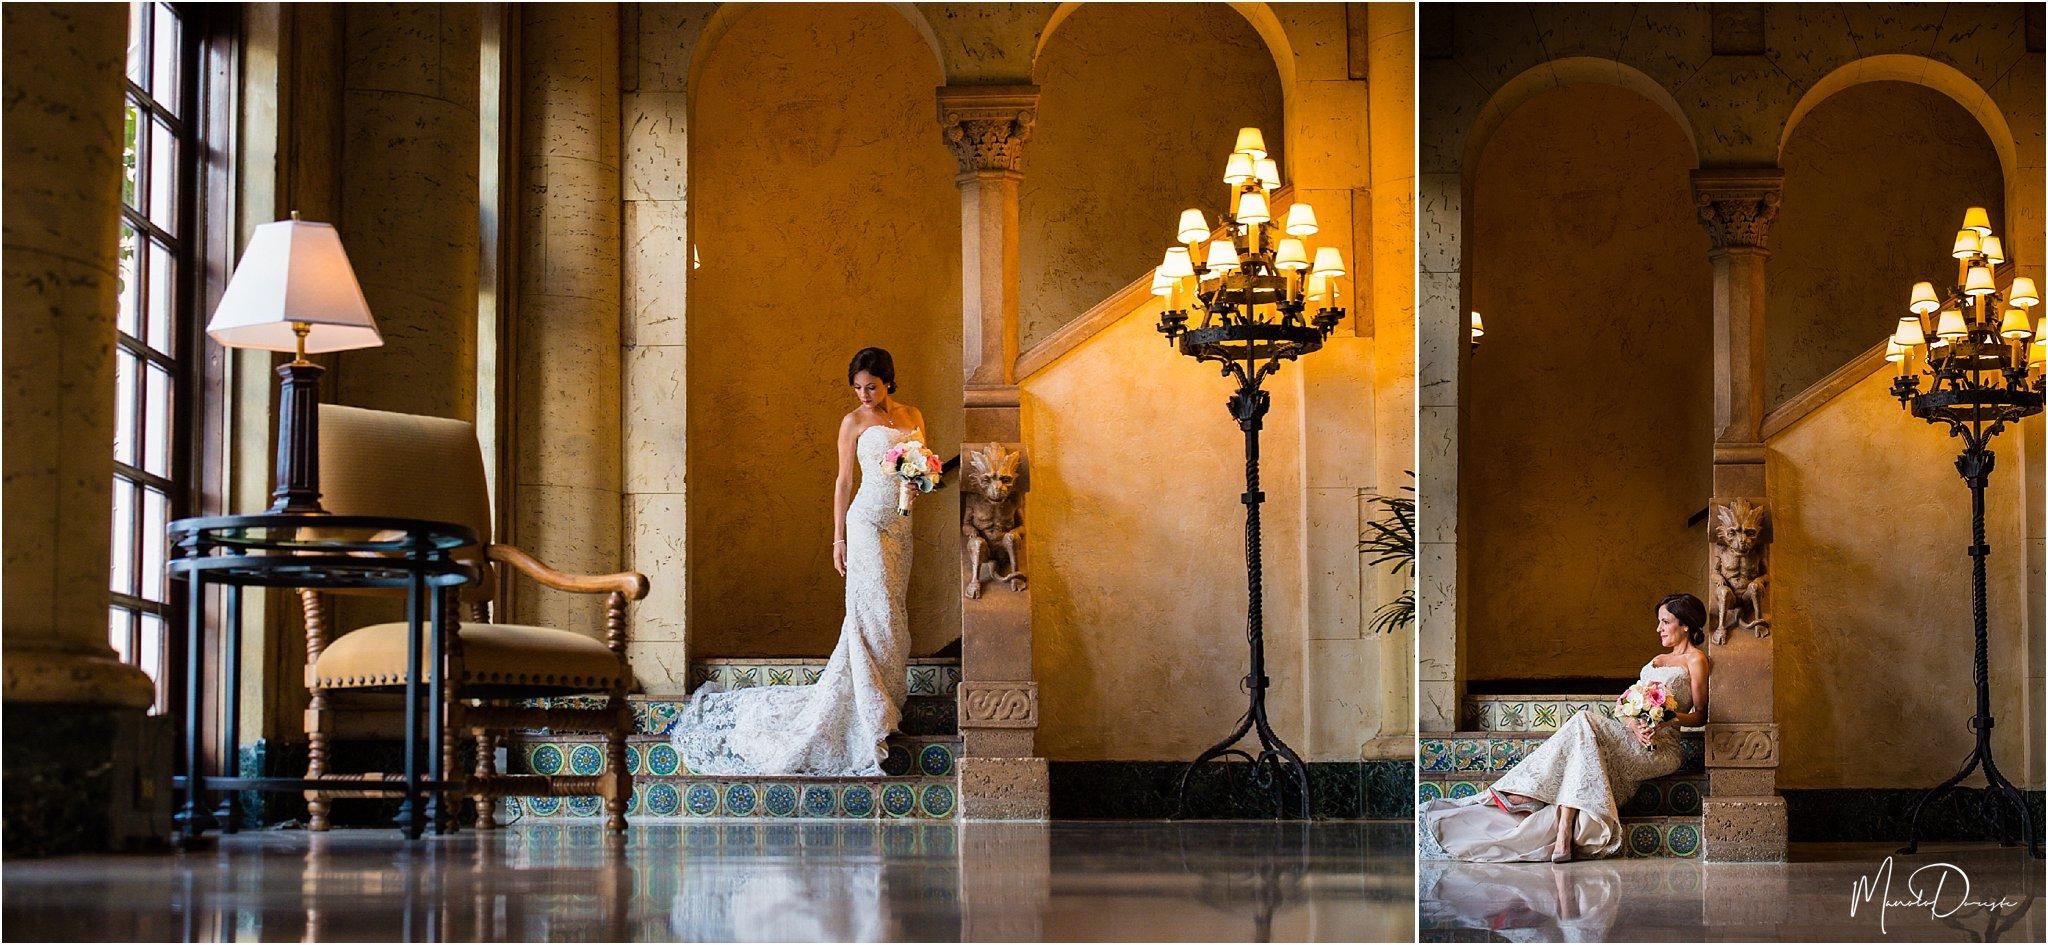 00835_ManoloDoreste_InFocusStudios_Wedding_Family_Photography_Miami_MiamiPhotographer.jpg